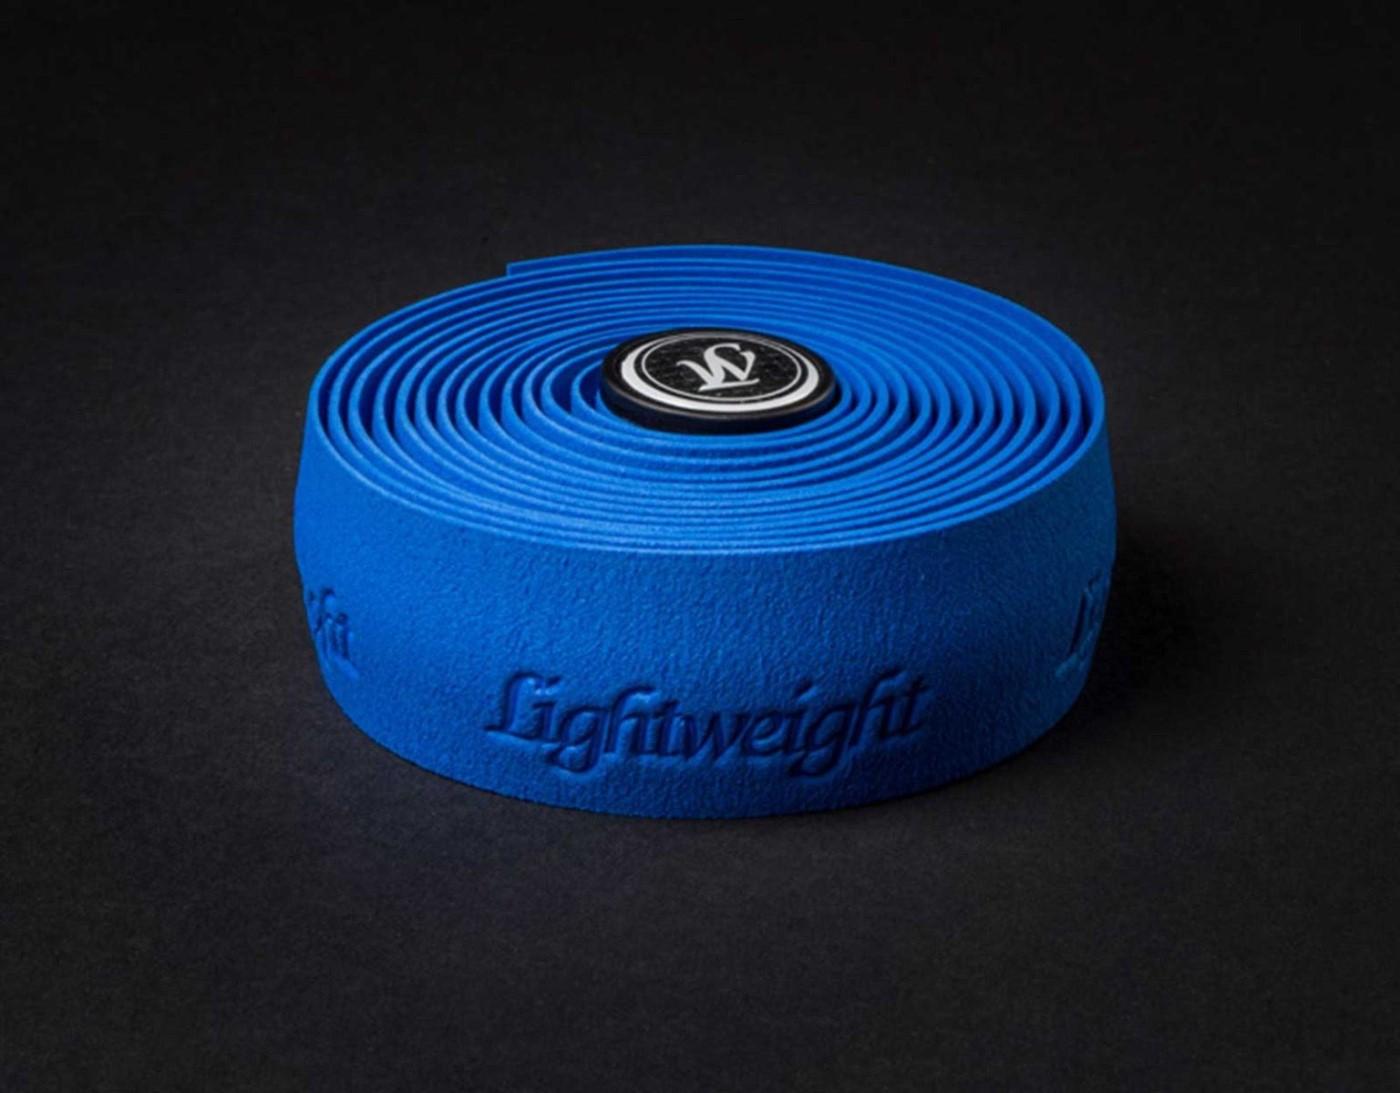 Omotávka LIGHTWEIGHT Handband modrá